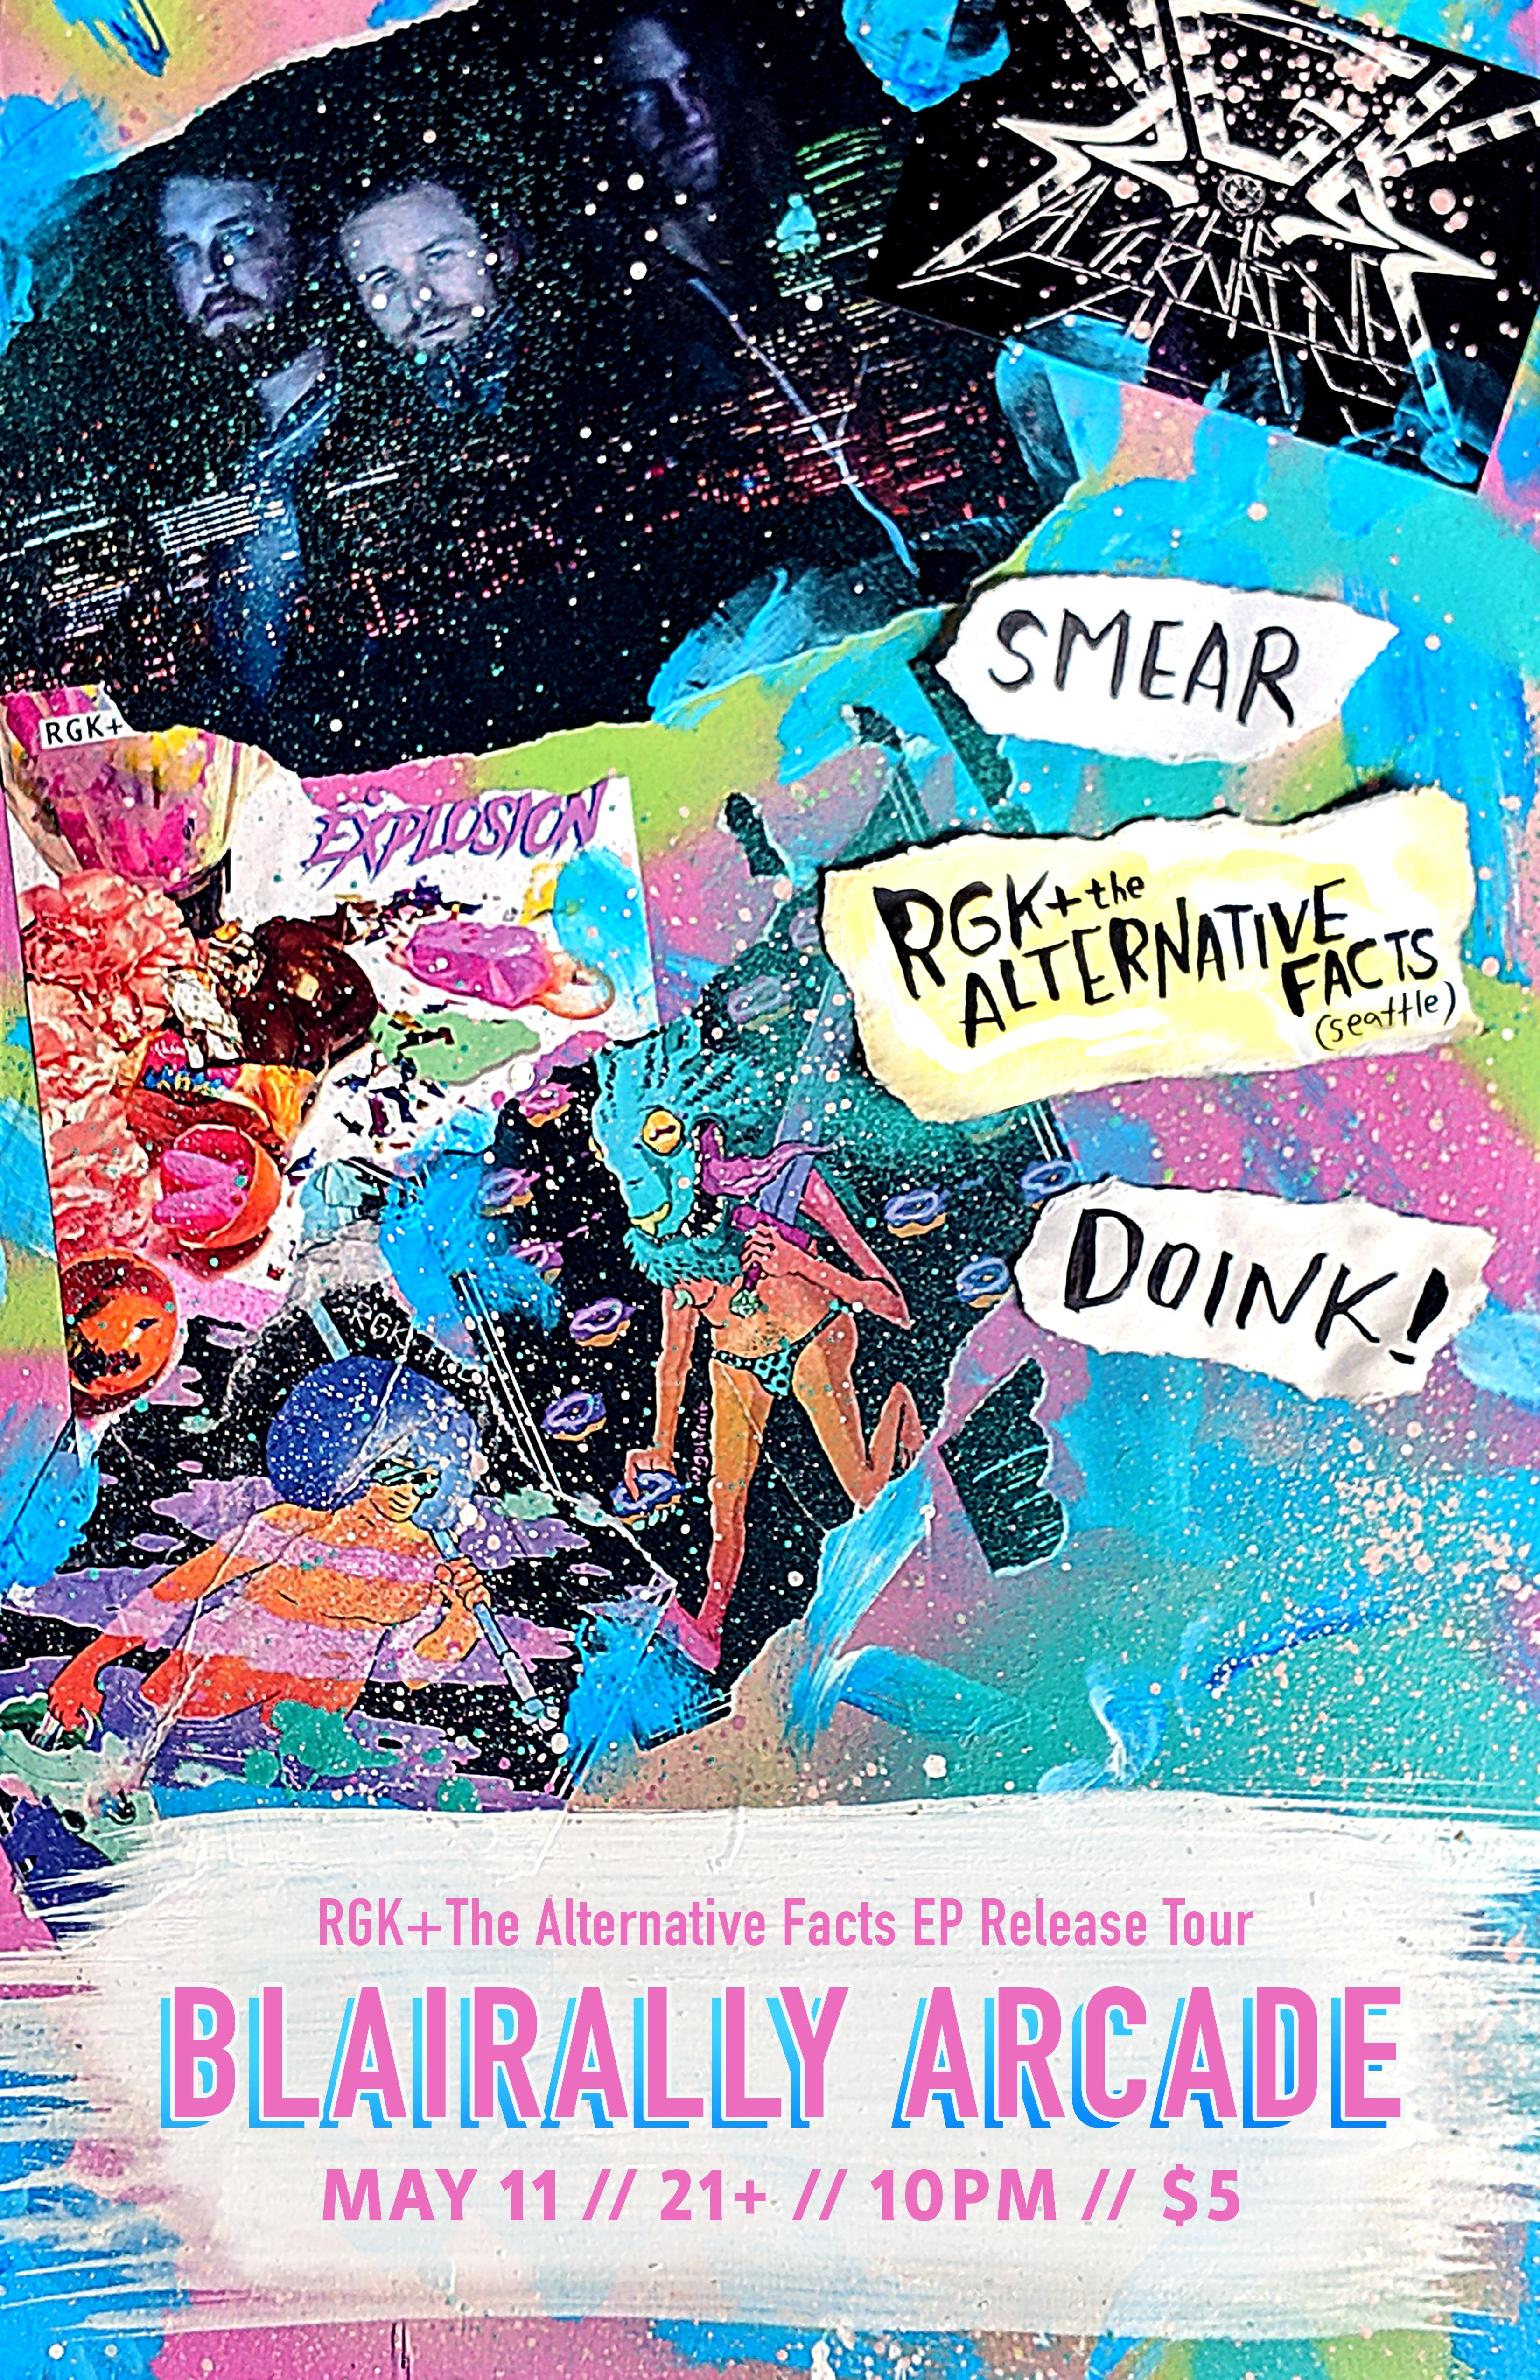 RGK+ The Alternative Facts w/ Doink! / Smear @ Blairally Arcade